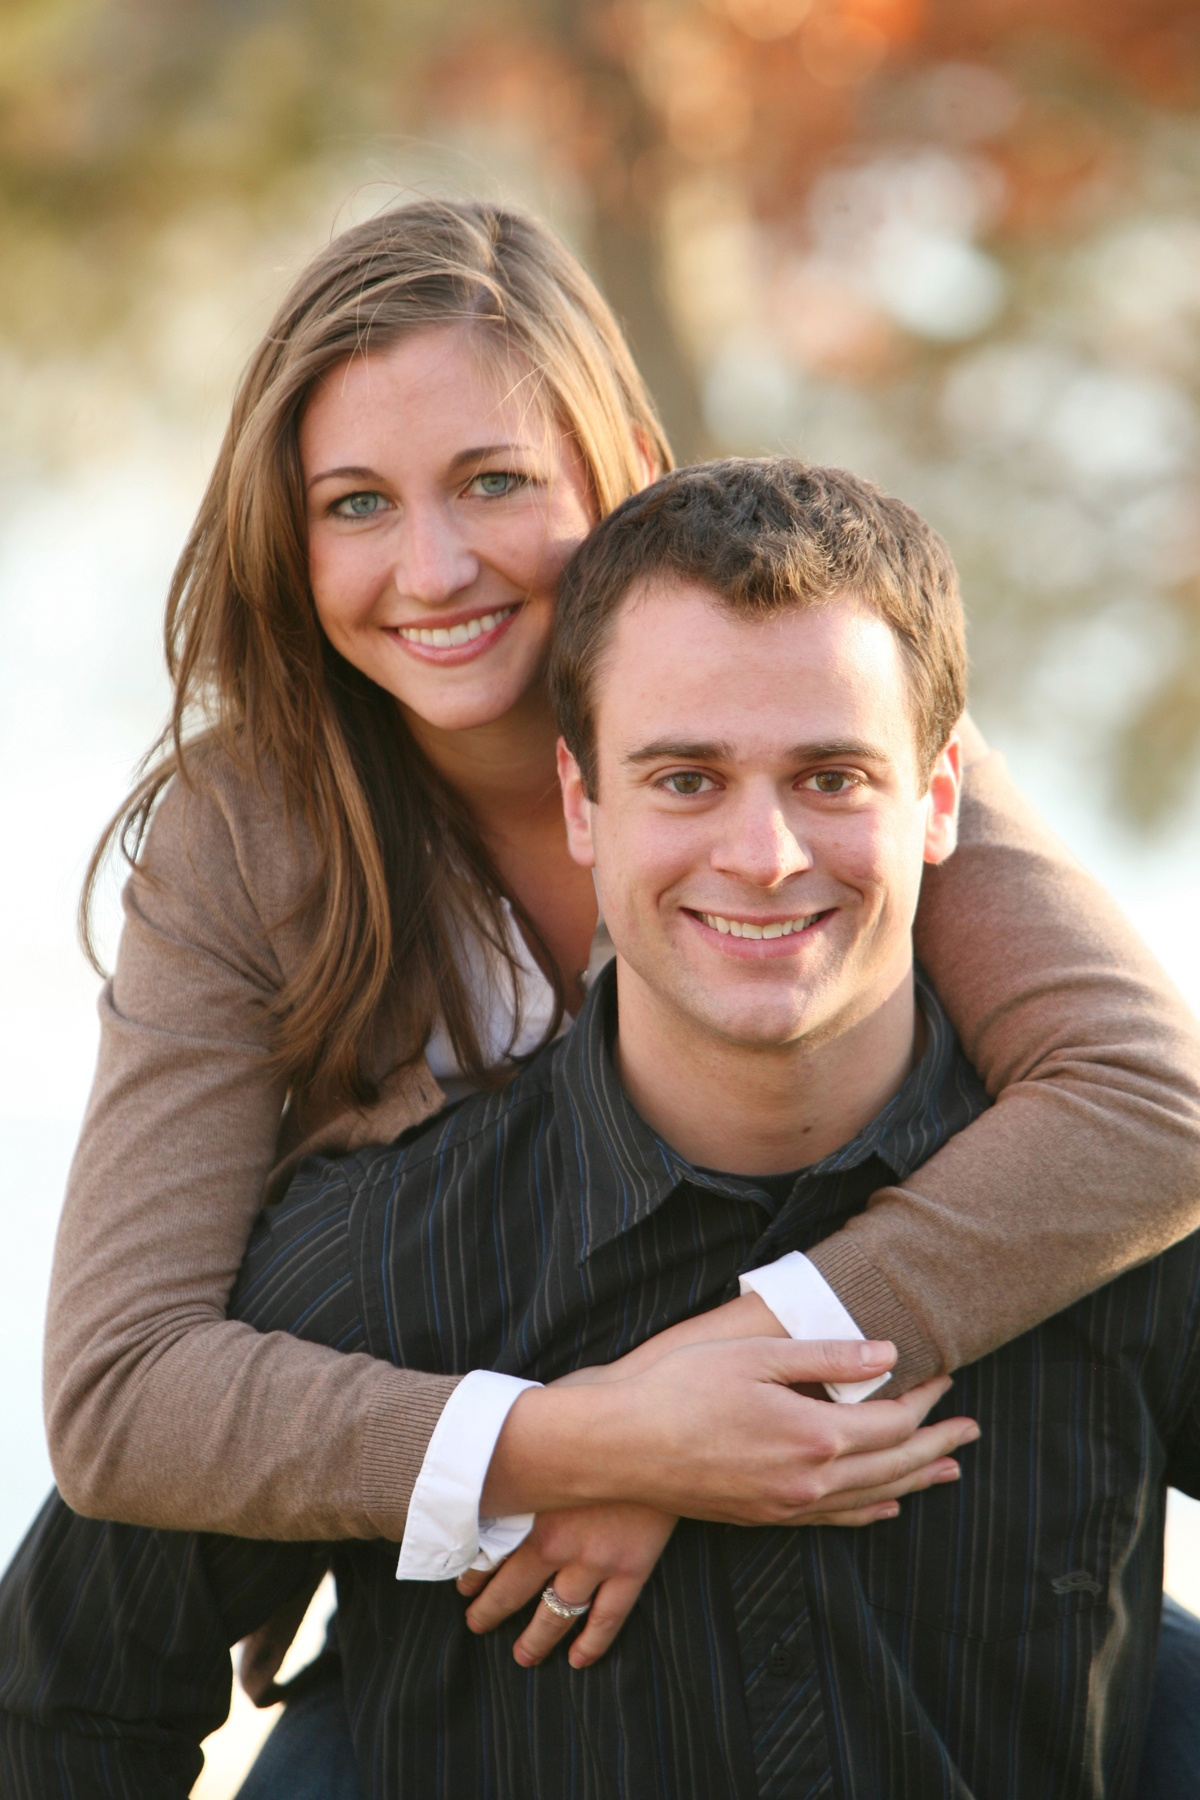 Andrew and Kayla Ferguson